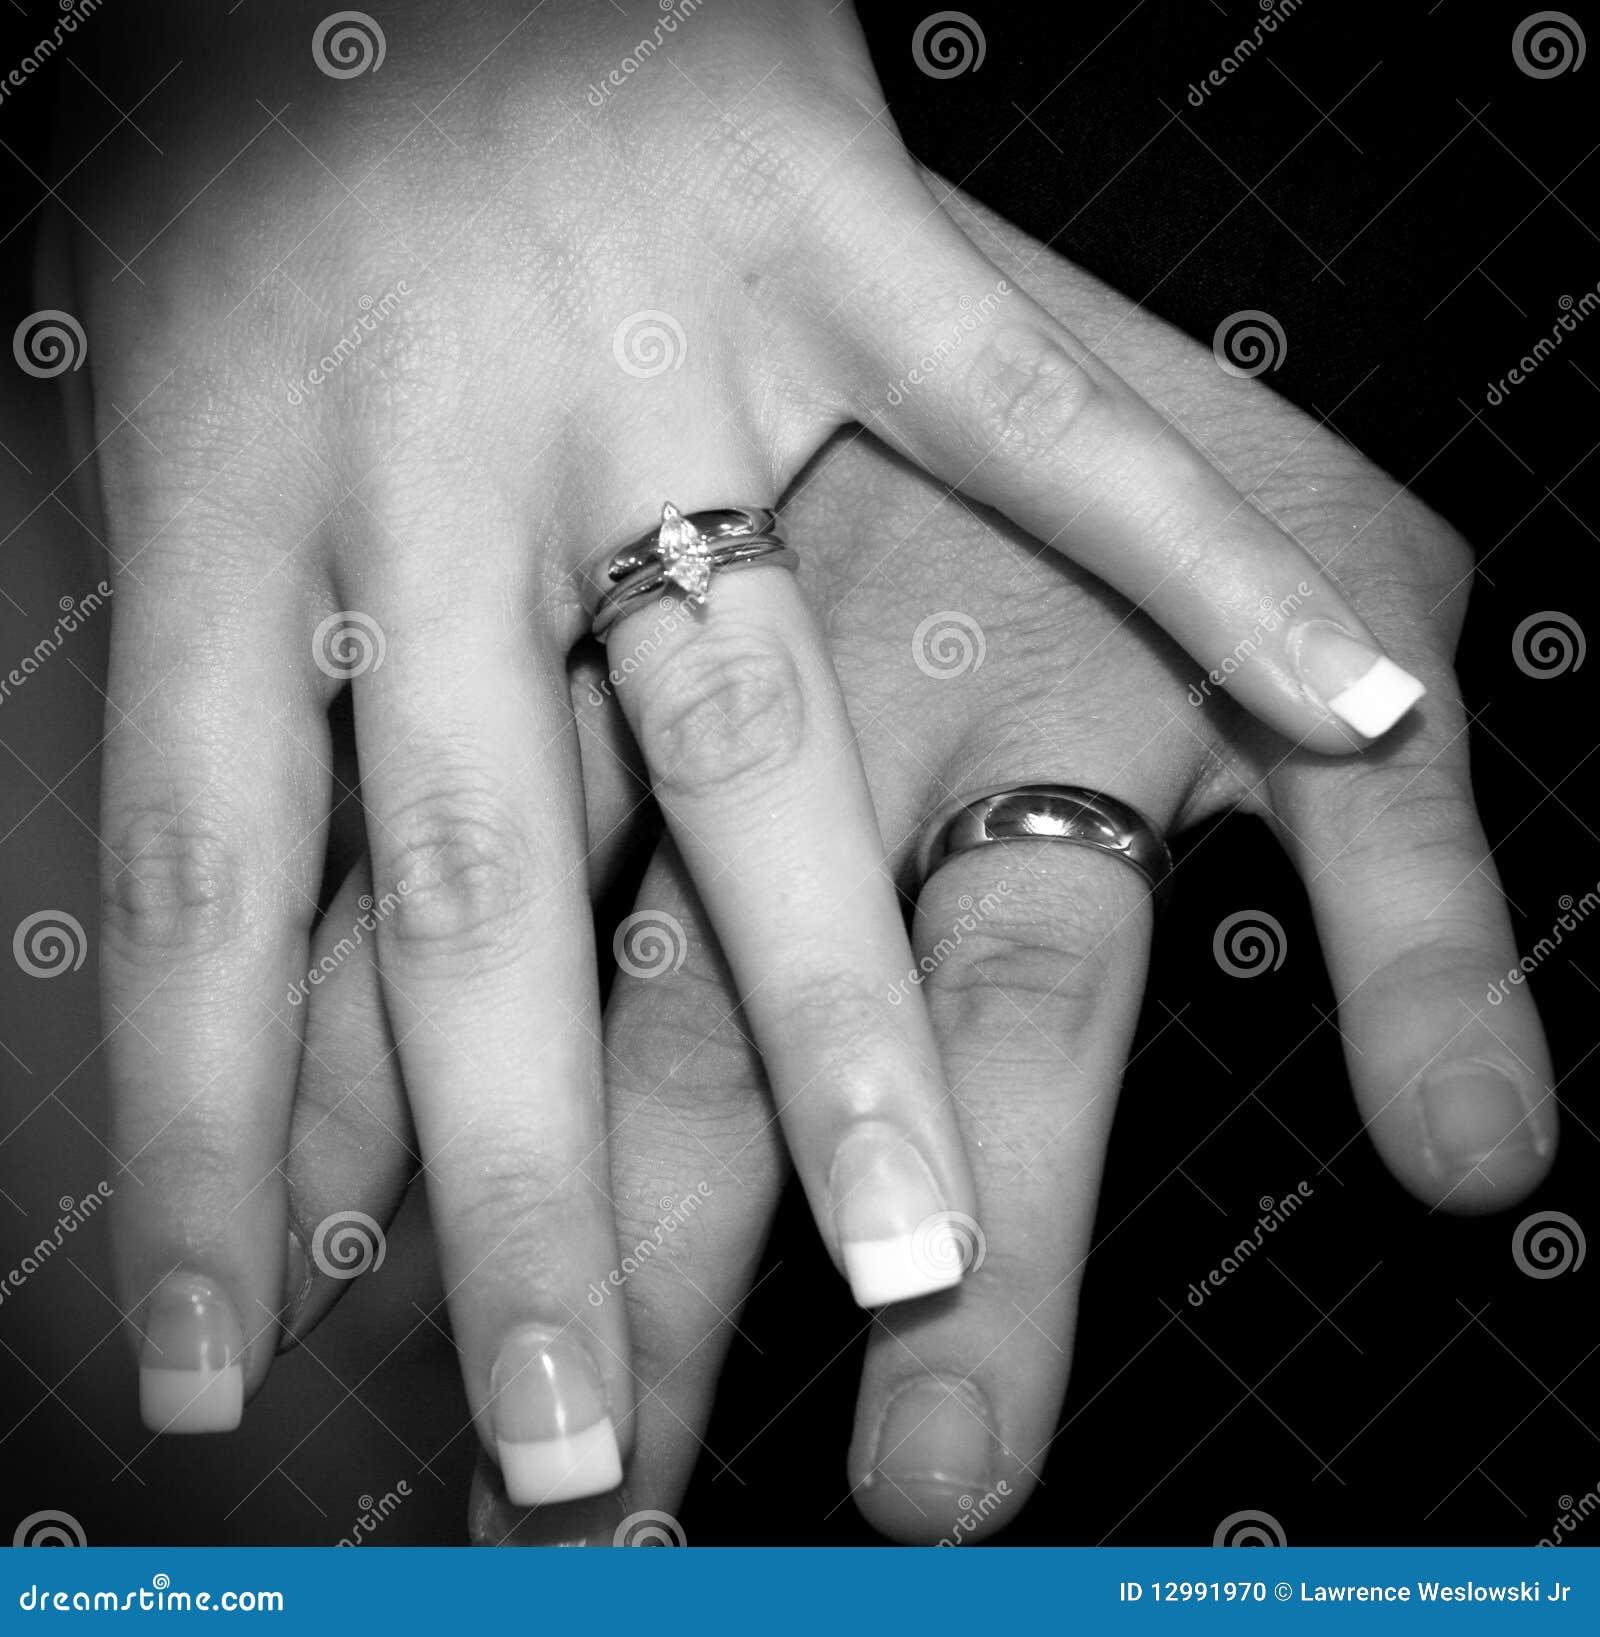 Marrige Bride Groom Hands With Wedding Rings Stock Photo Image